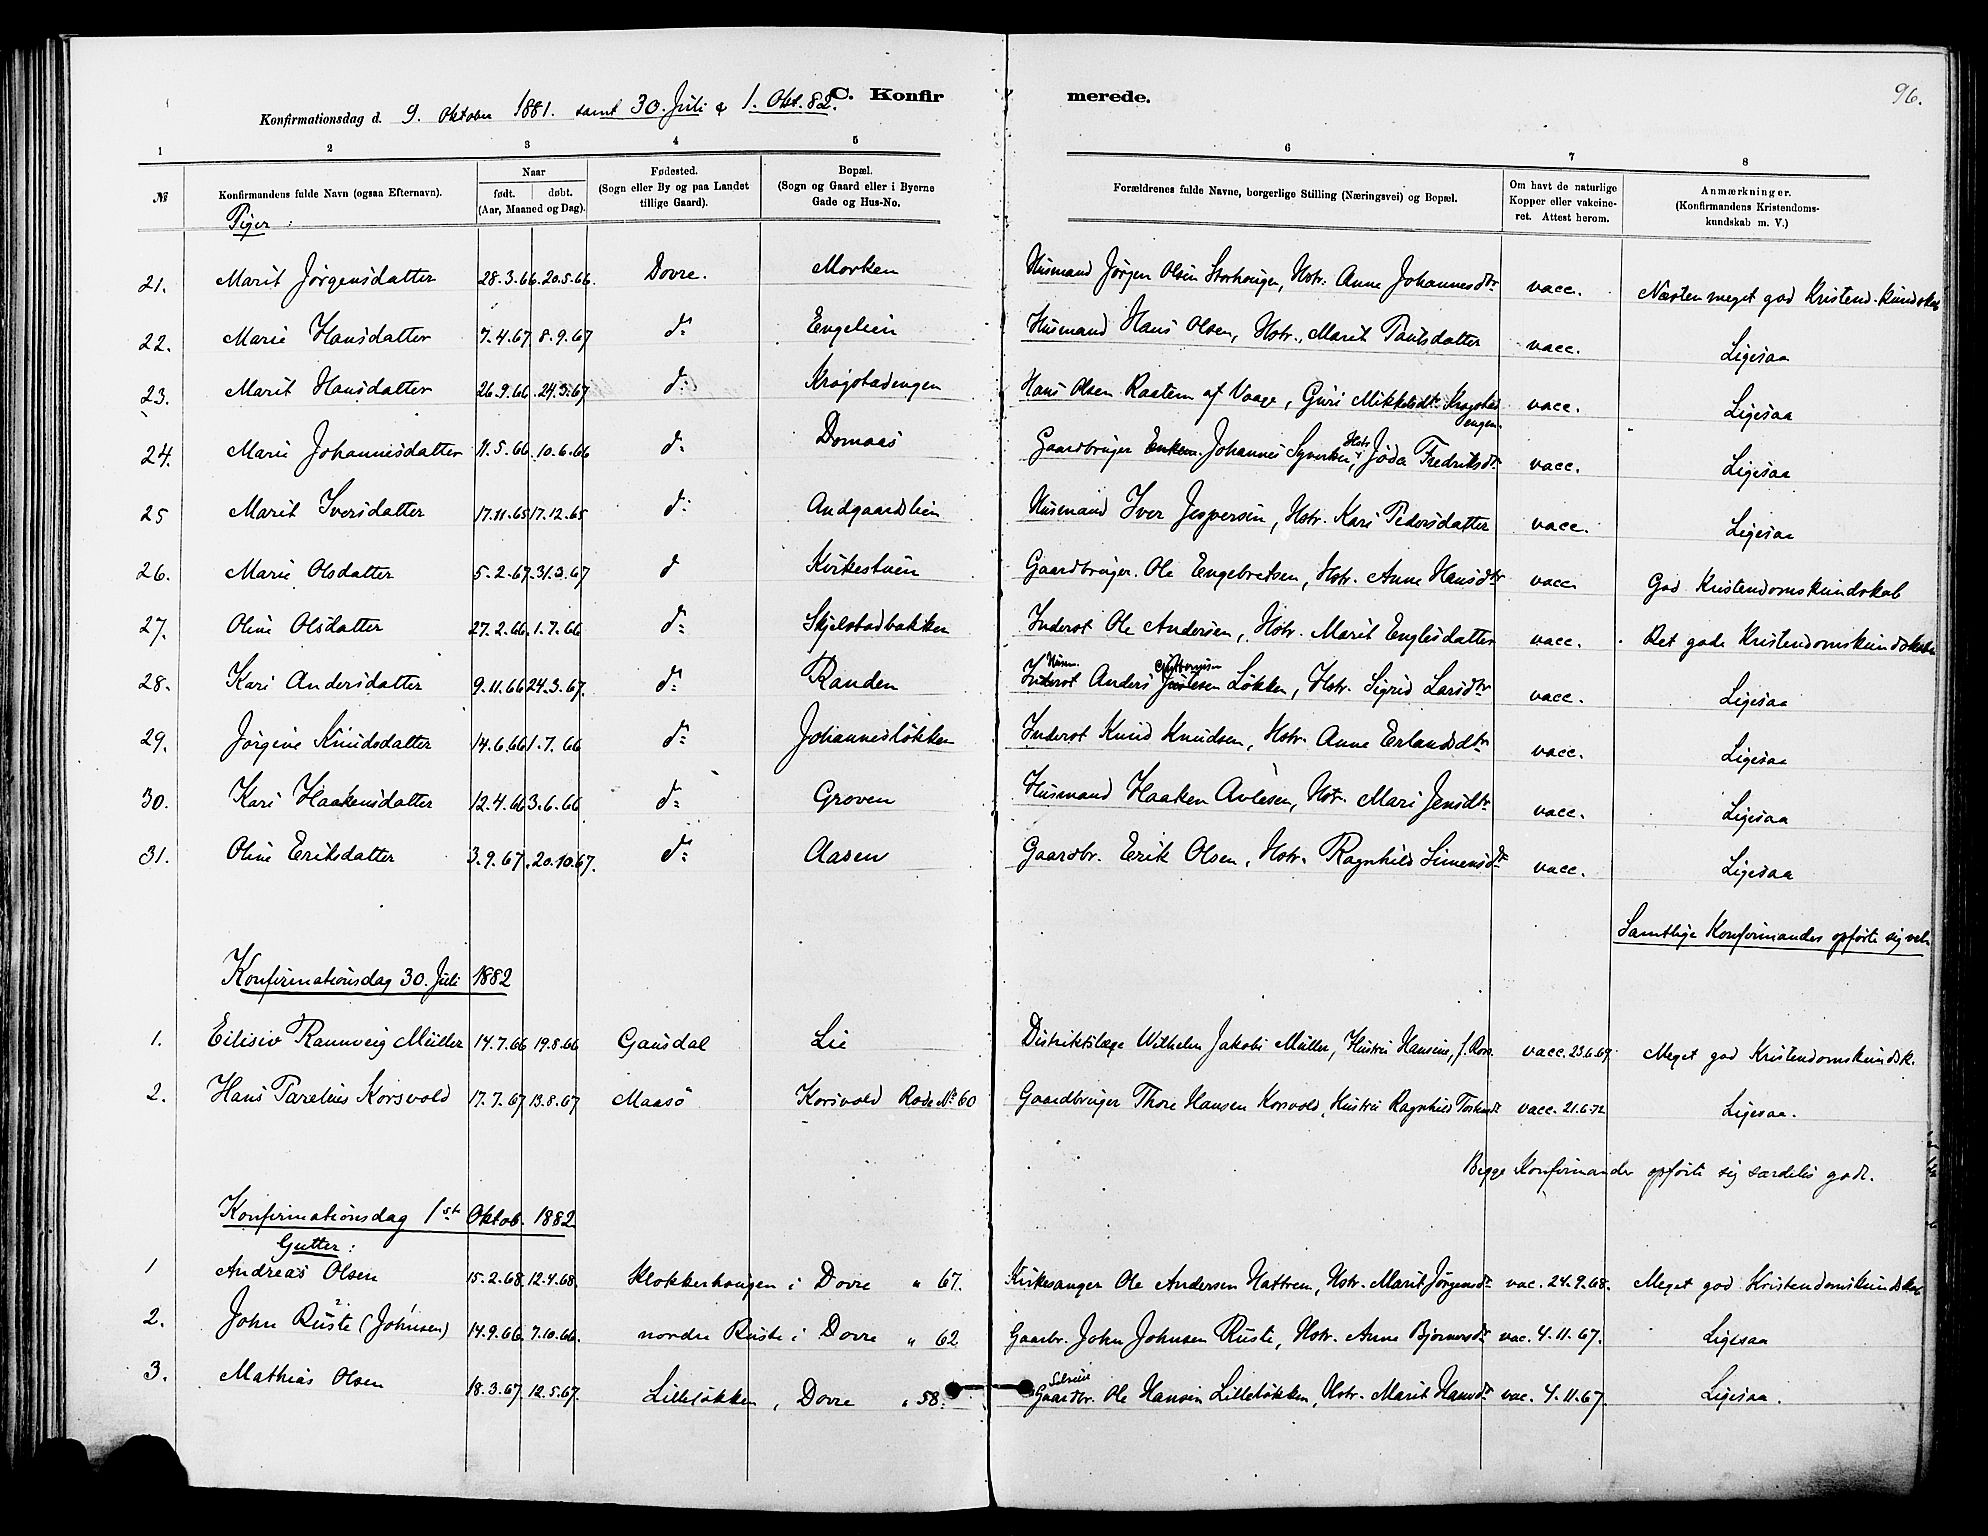 SAH, Dovre prestekontor, Ministerialbok nr. 2, 1879-1890, s. 96